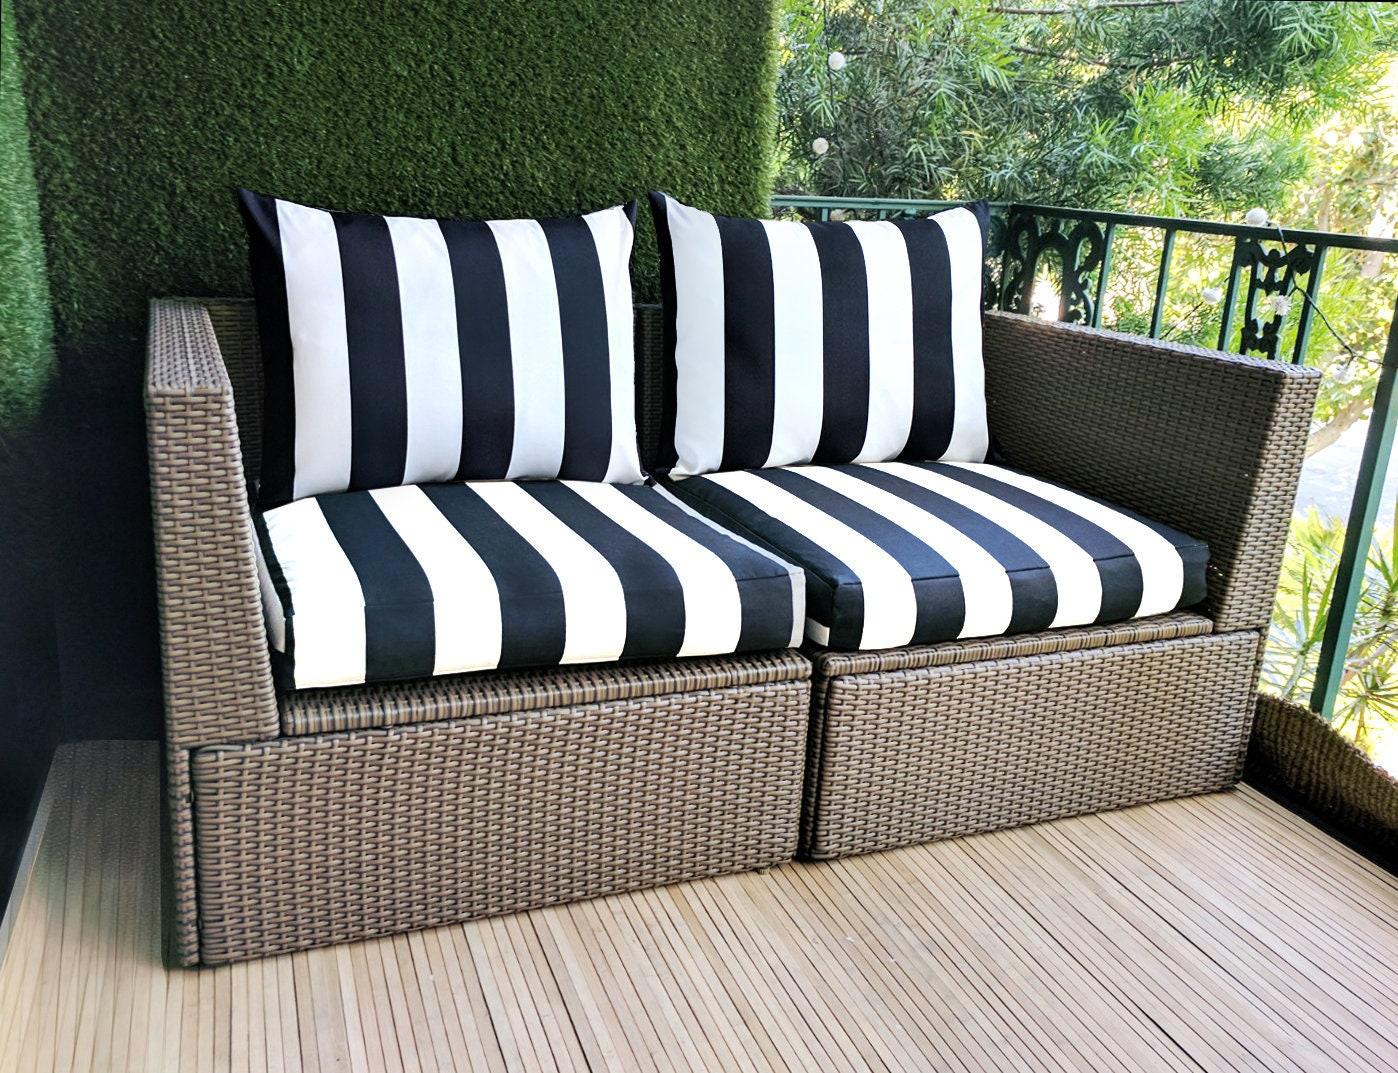 ikea hallo kungso outdoor slip cover ikea cushion covers etsy. Black Bedroom Furniture Sets. Home Design Ideas